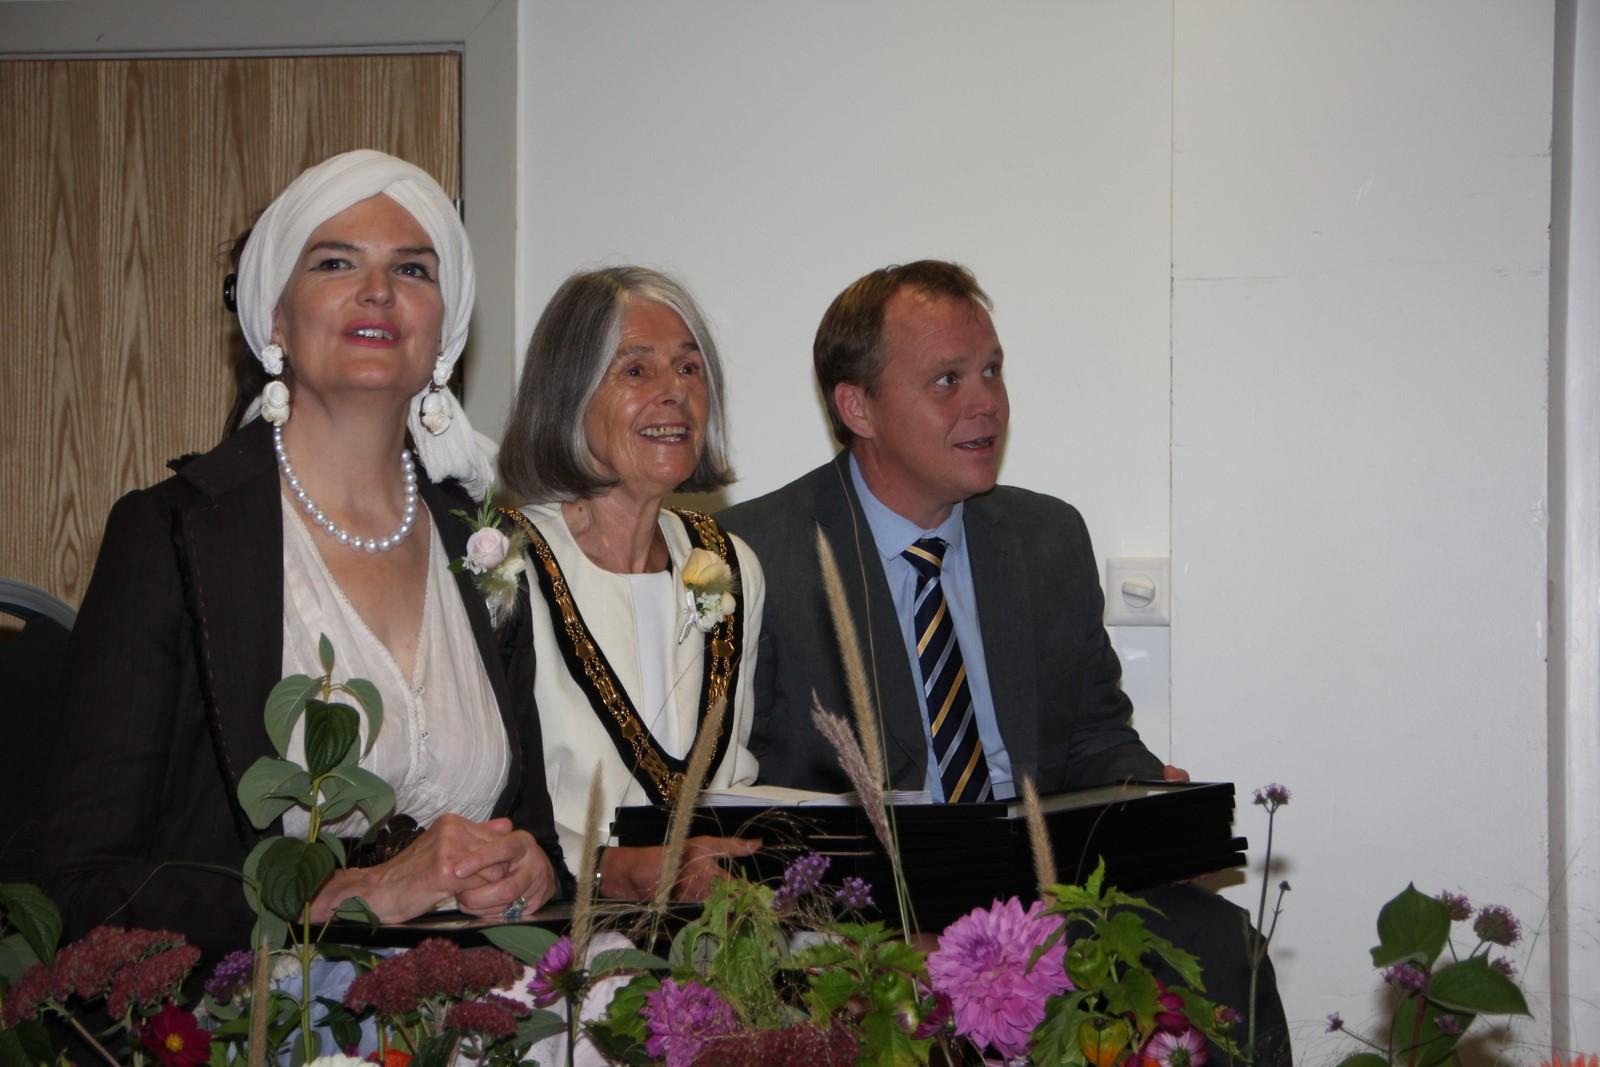 Lady Emma Fellowes. Mayor of Taunton, Terry Doyle, sponsor